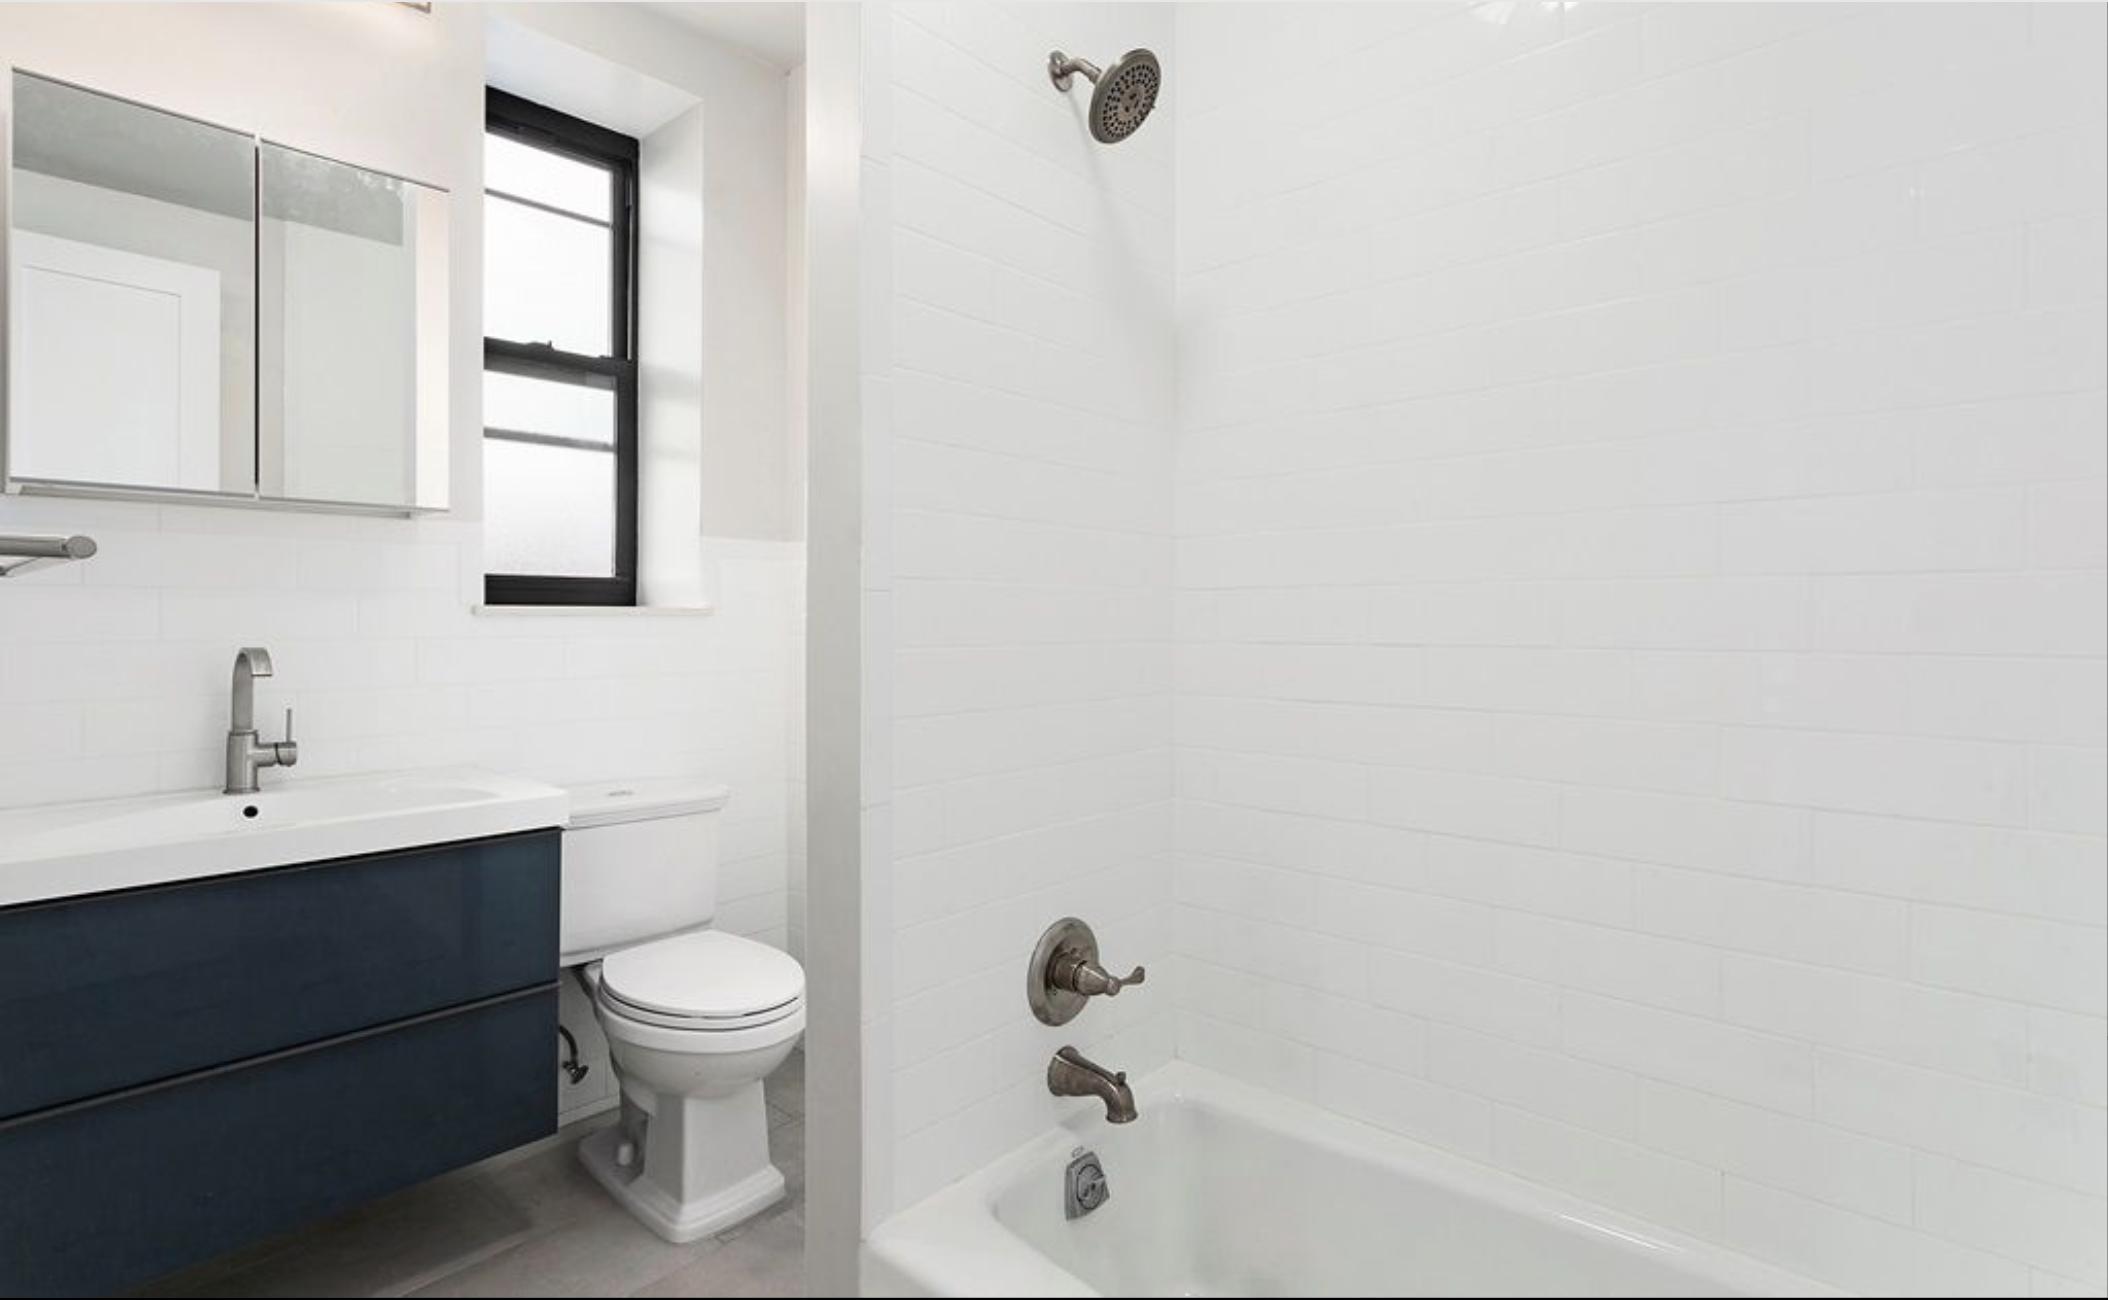 490A Jefferson Avenue Bathroom.png